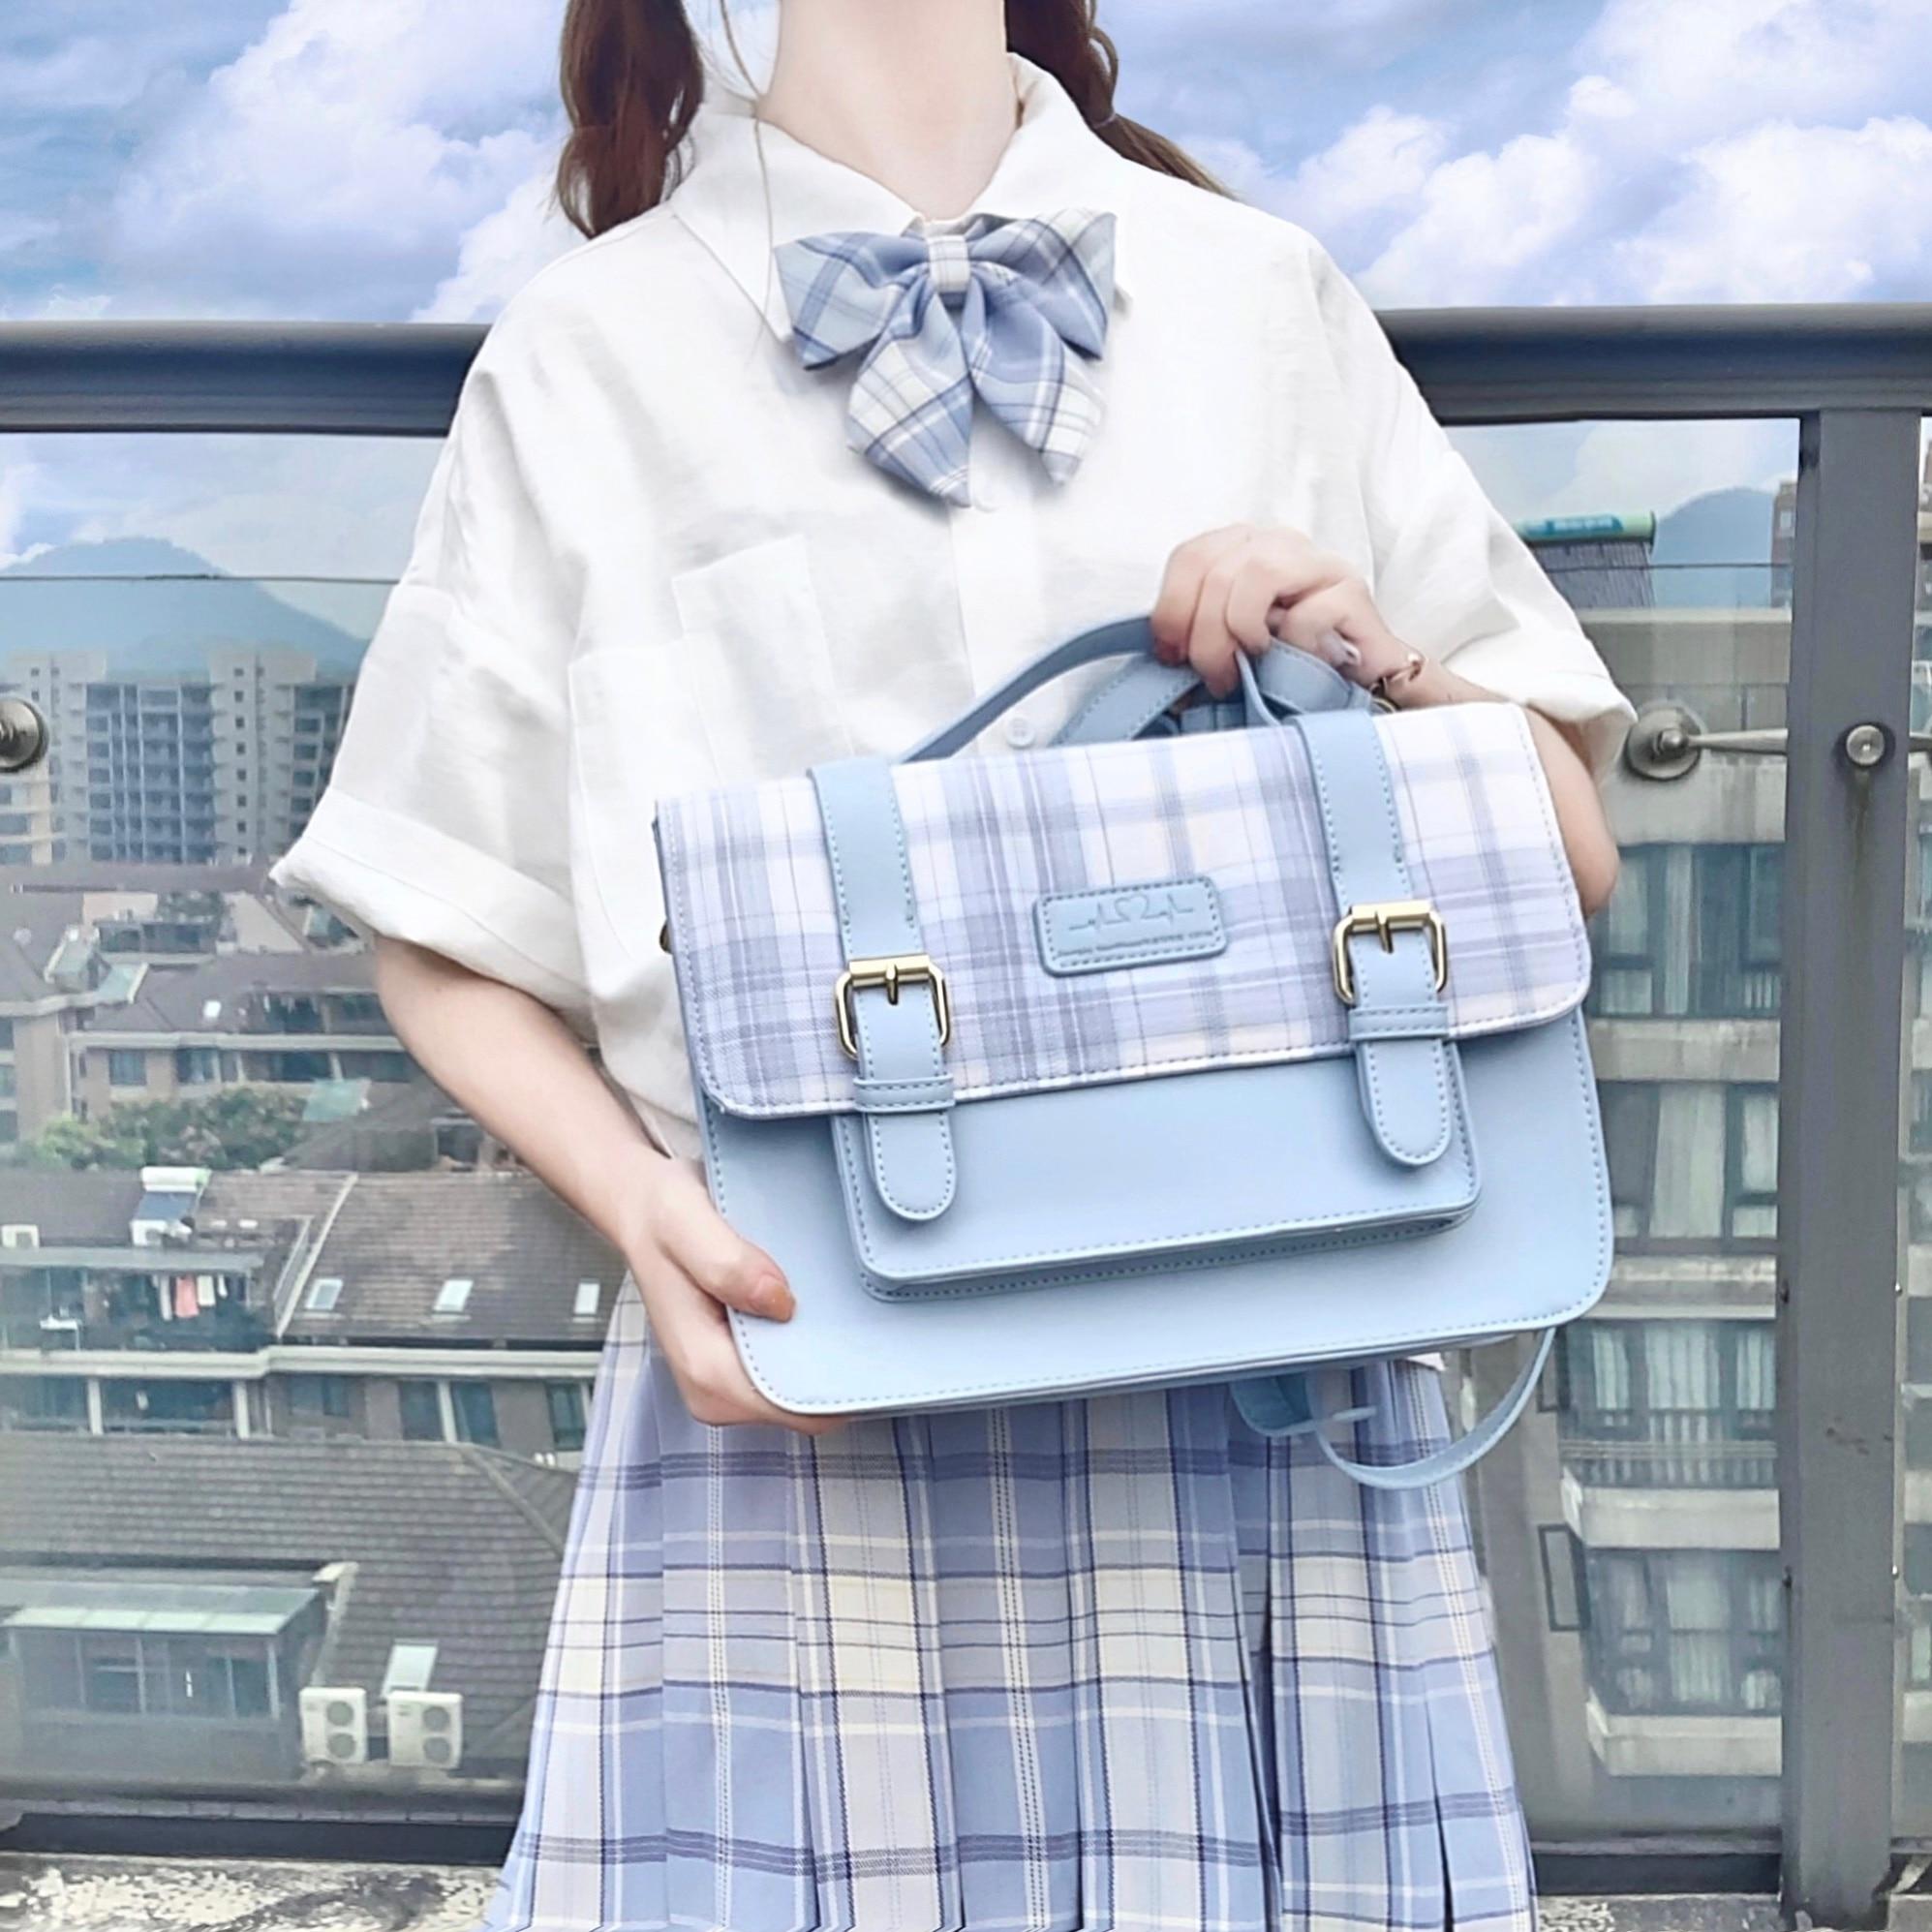 Small Fresh School Student JK Uniform Lattice Cambridge Satchel Handbag College Style Girl Japanese Messenger Bag Shoulder Bags